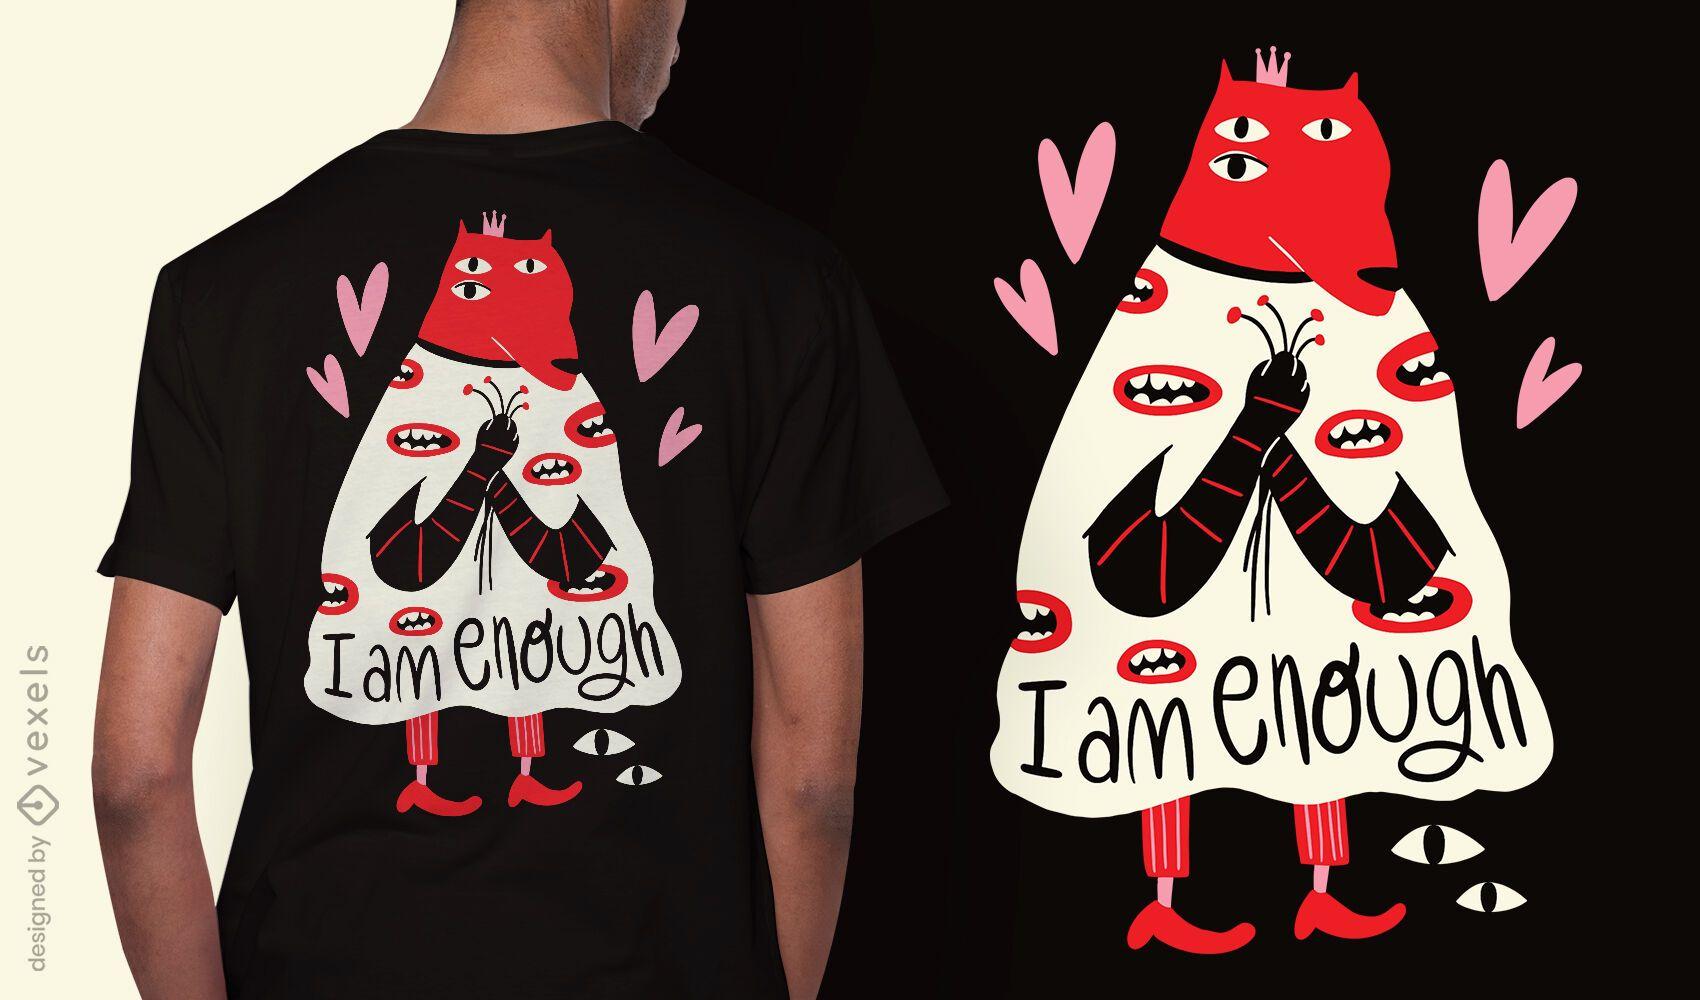 Self-love creature abstract t-shirt design